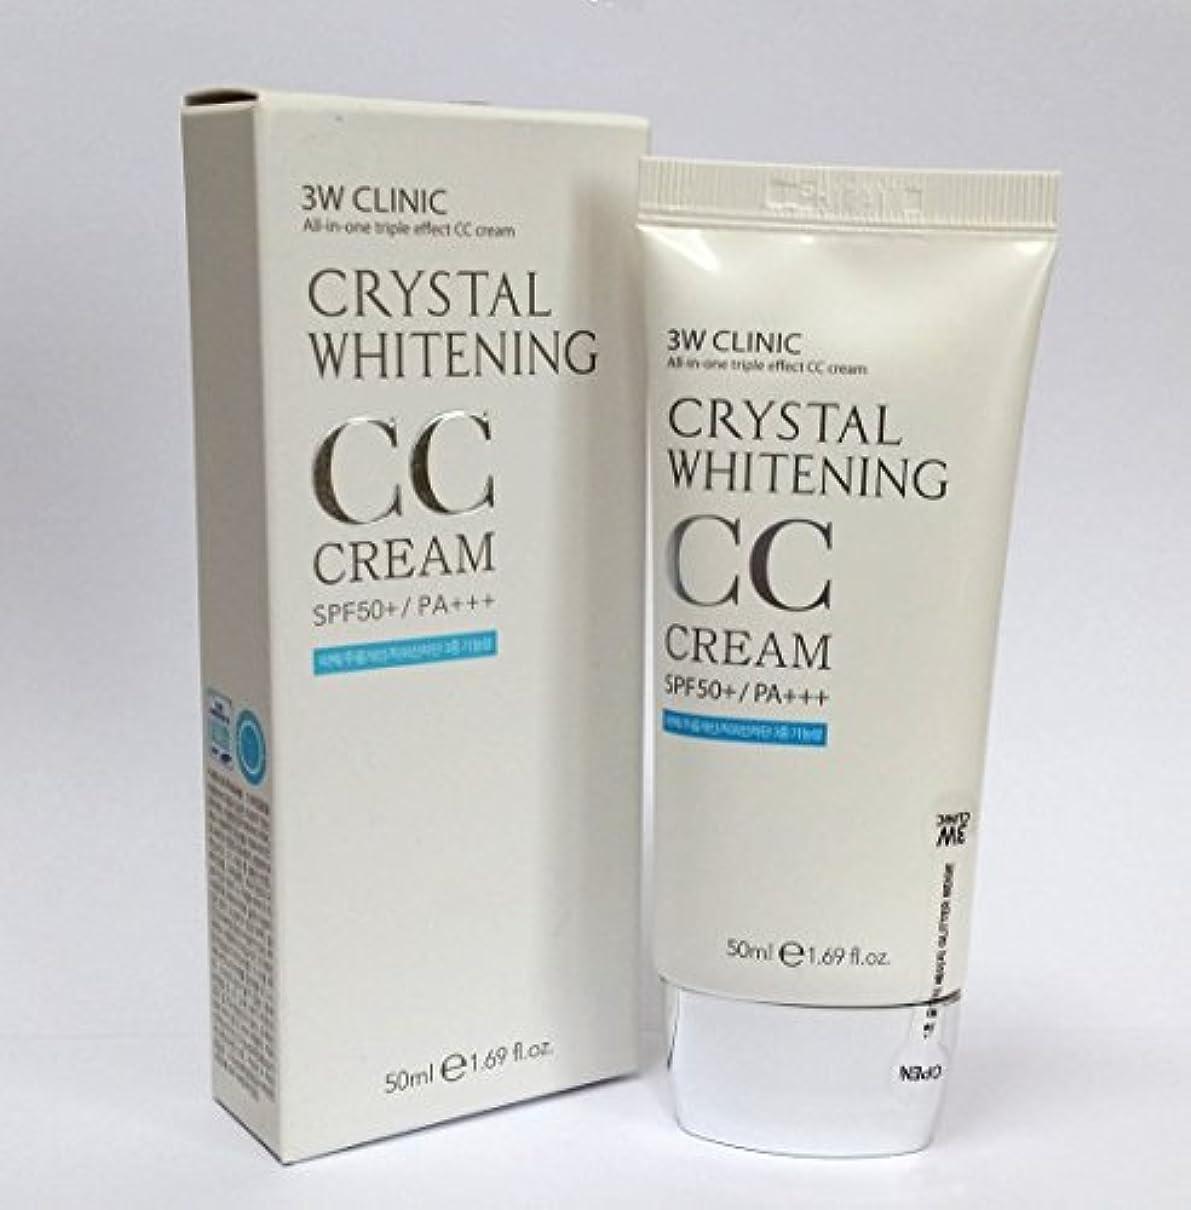 [3W CLINIC] クリスタルホワイトニングCCクリーム50ml SPF50 PA +++ / #02 Natural Beige / Crystal Whitening CC Cream 50ml SPF50 PA...